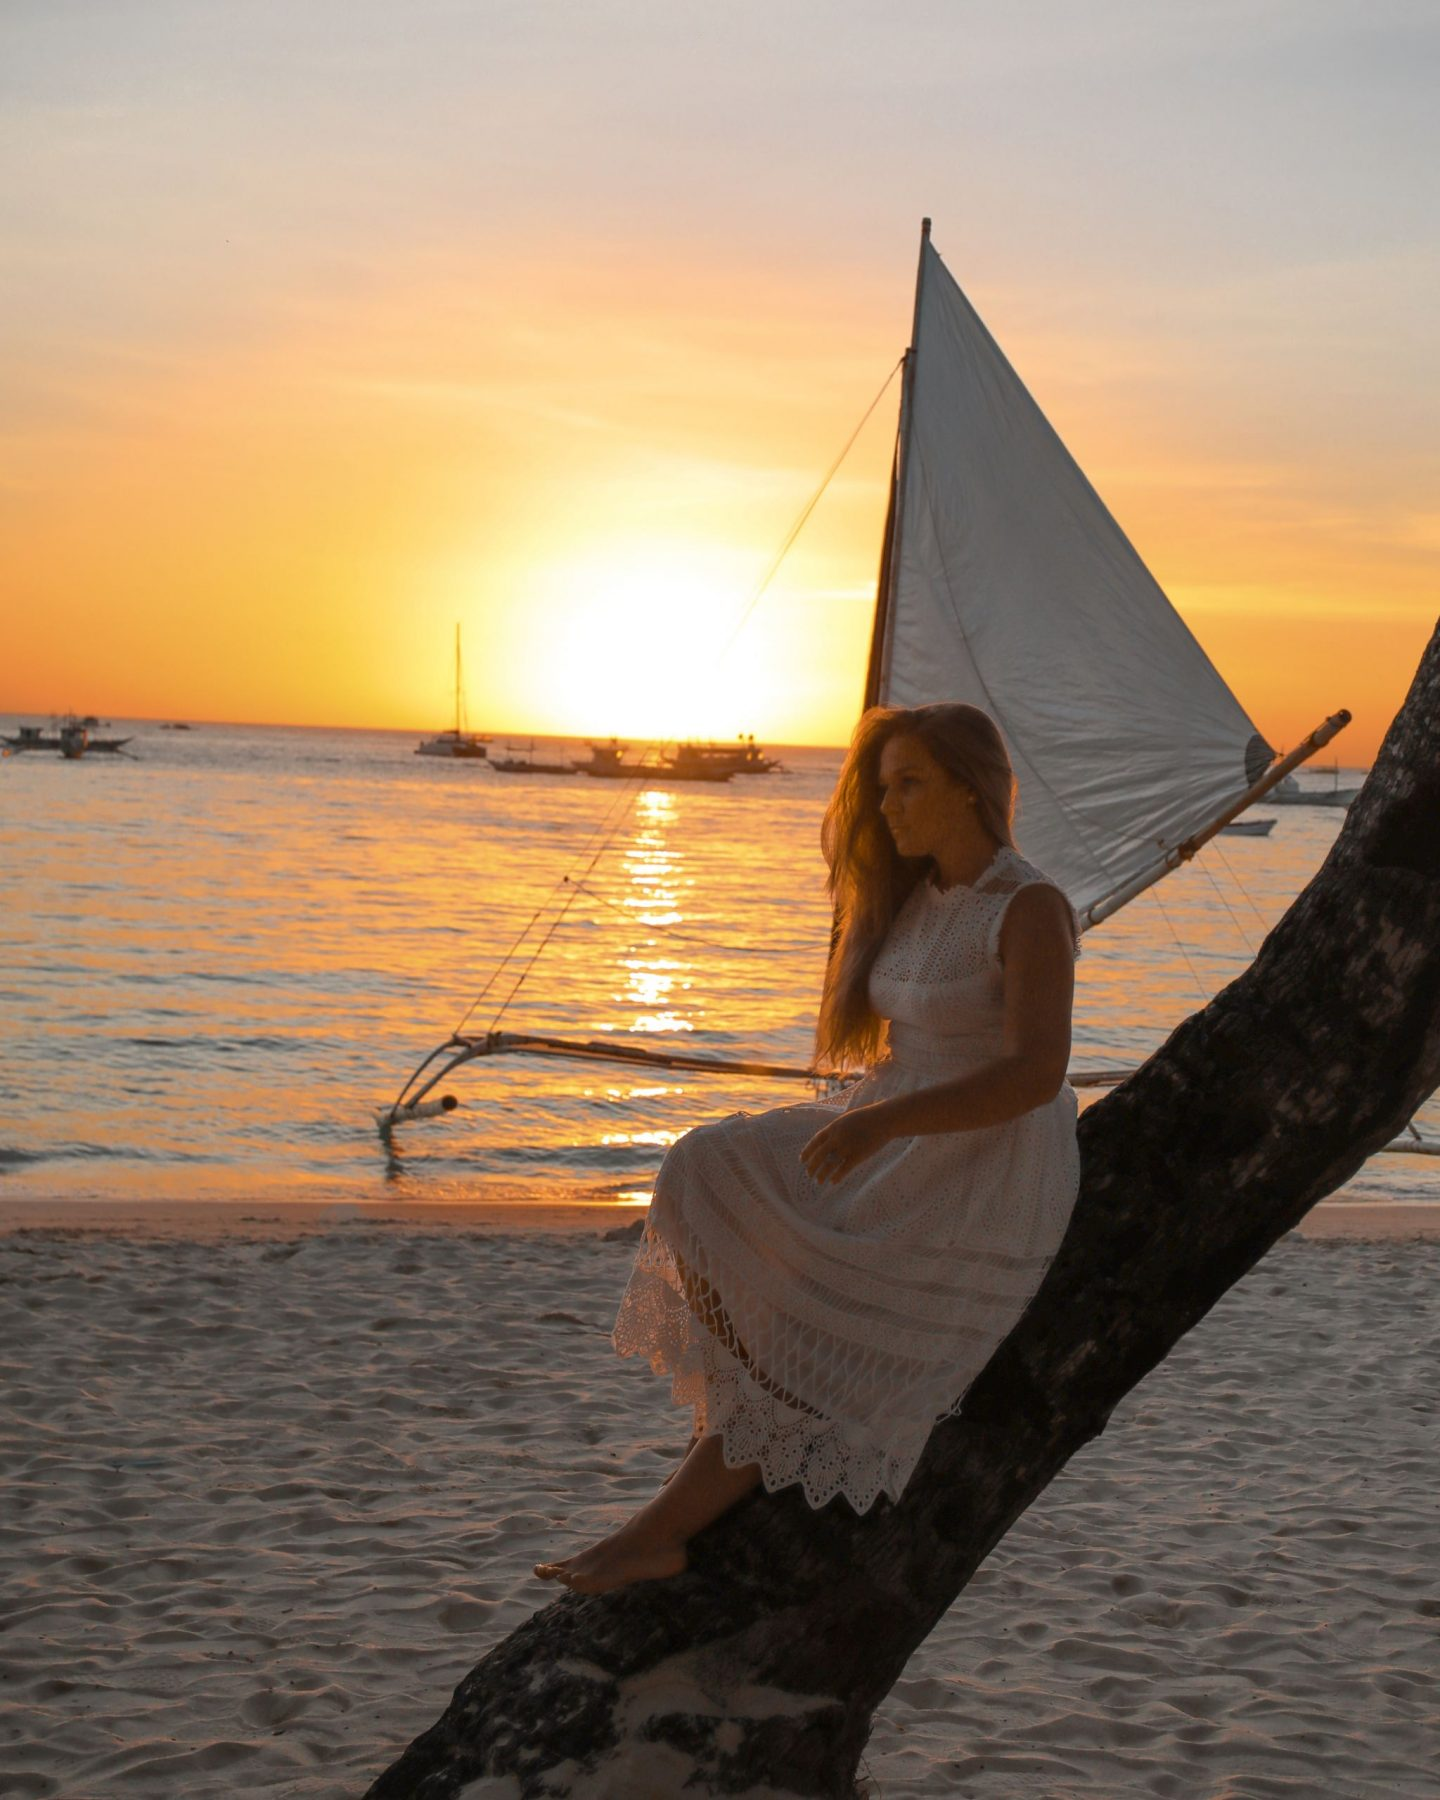 Katie Heath, KALANCHOE in The Philippines